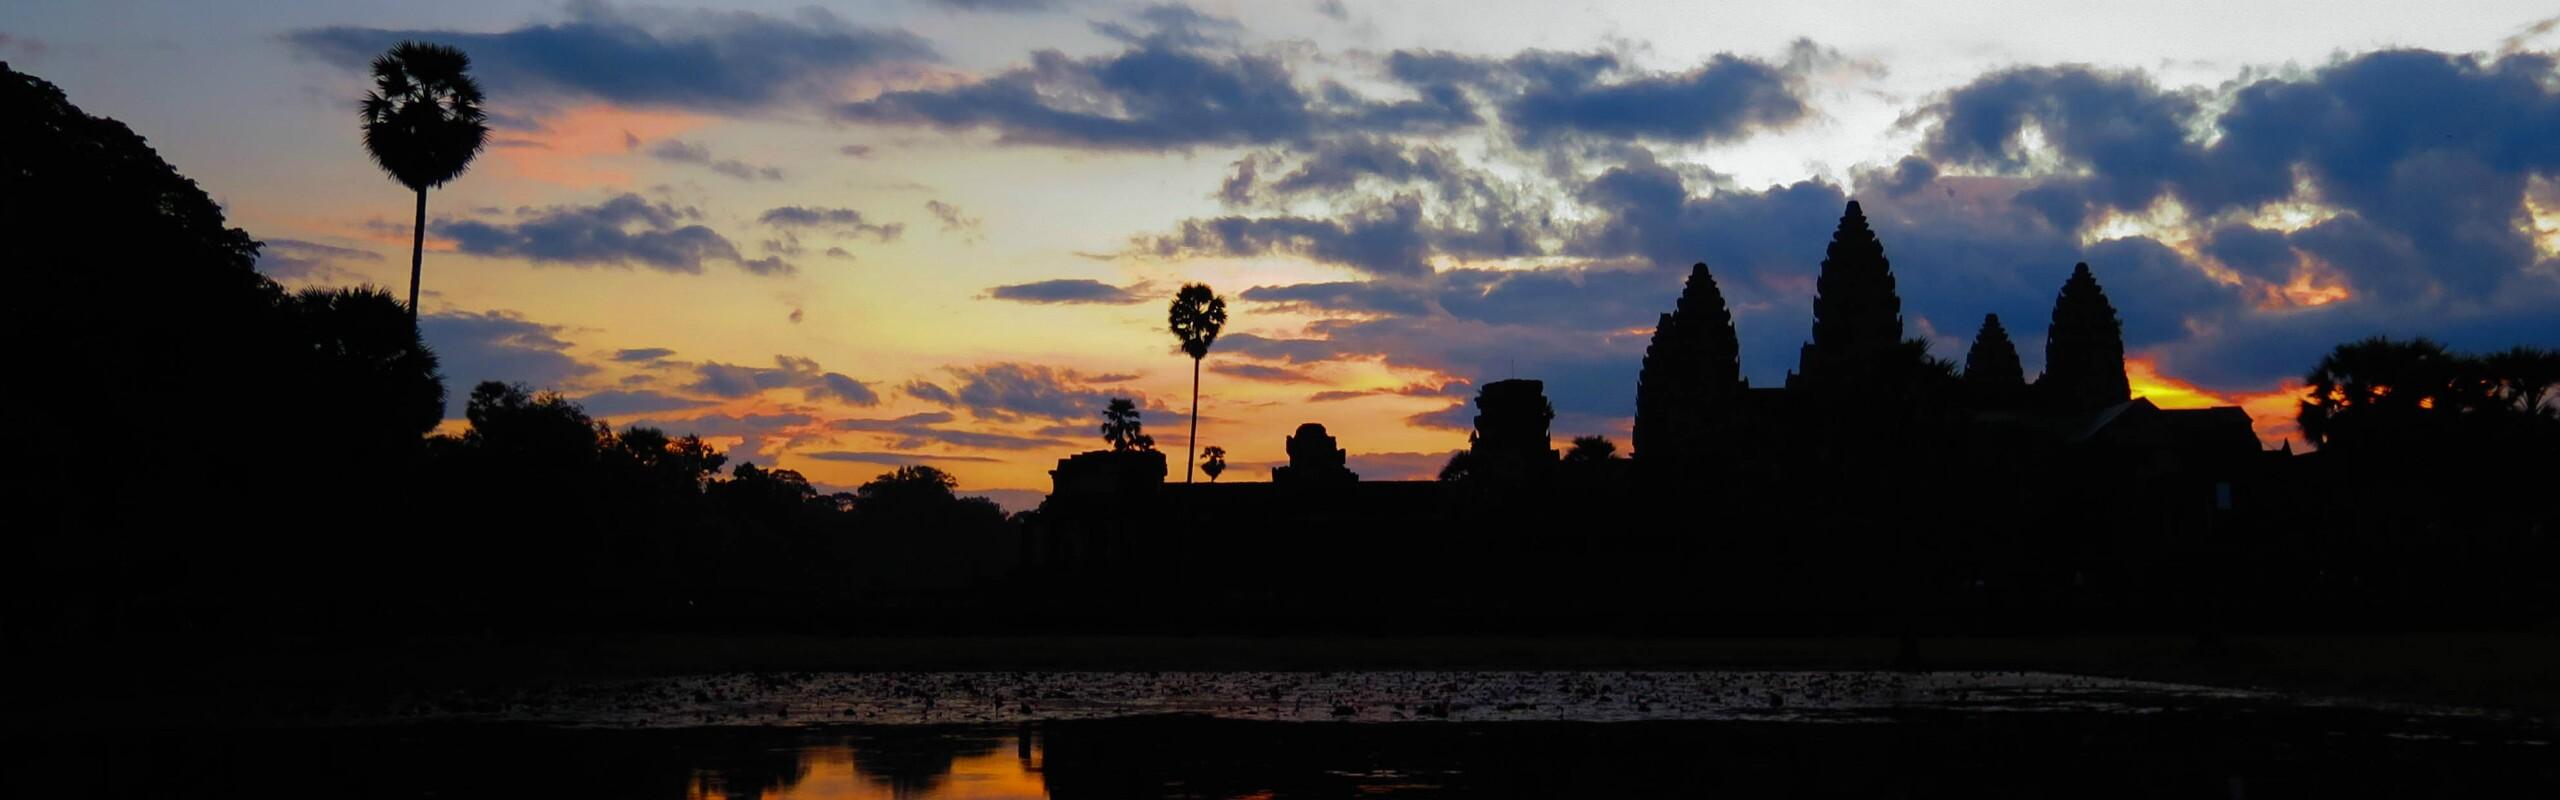 Top Attractions in Siem Reap